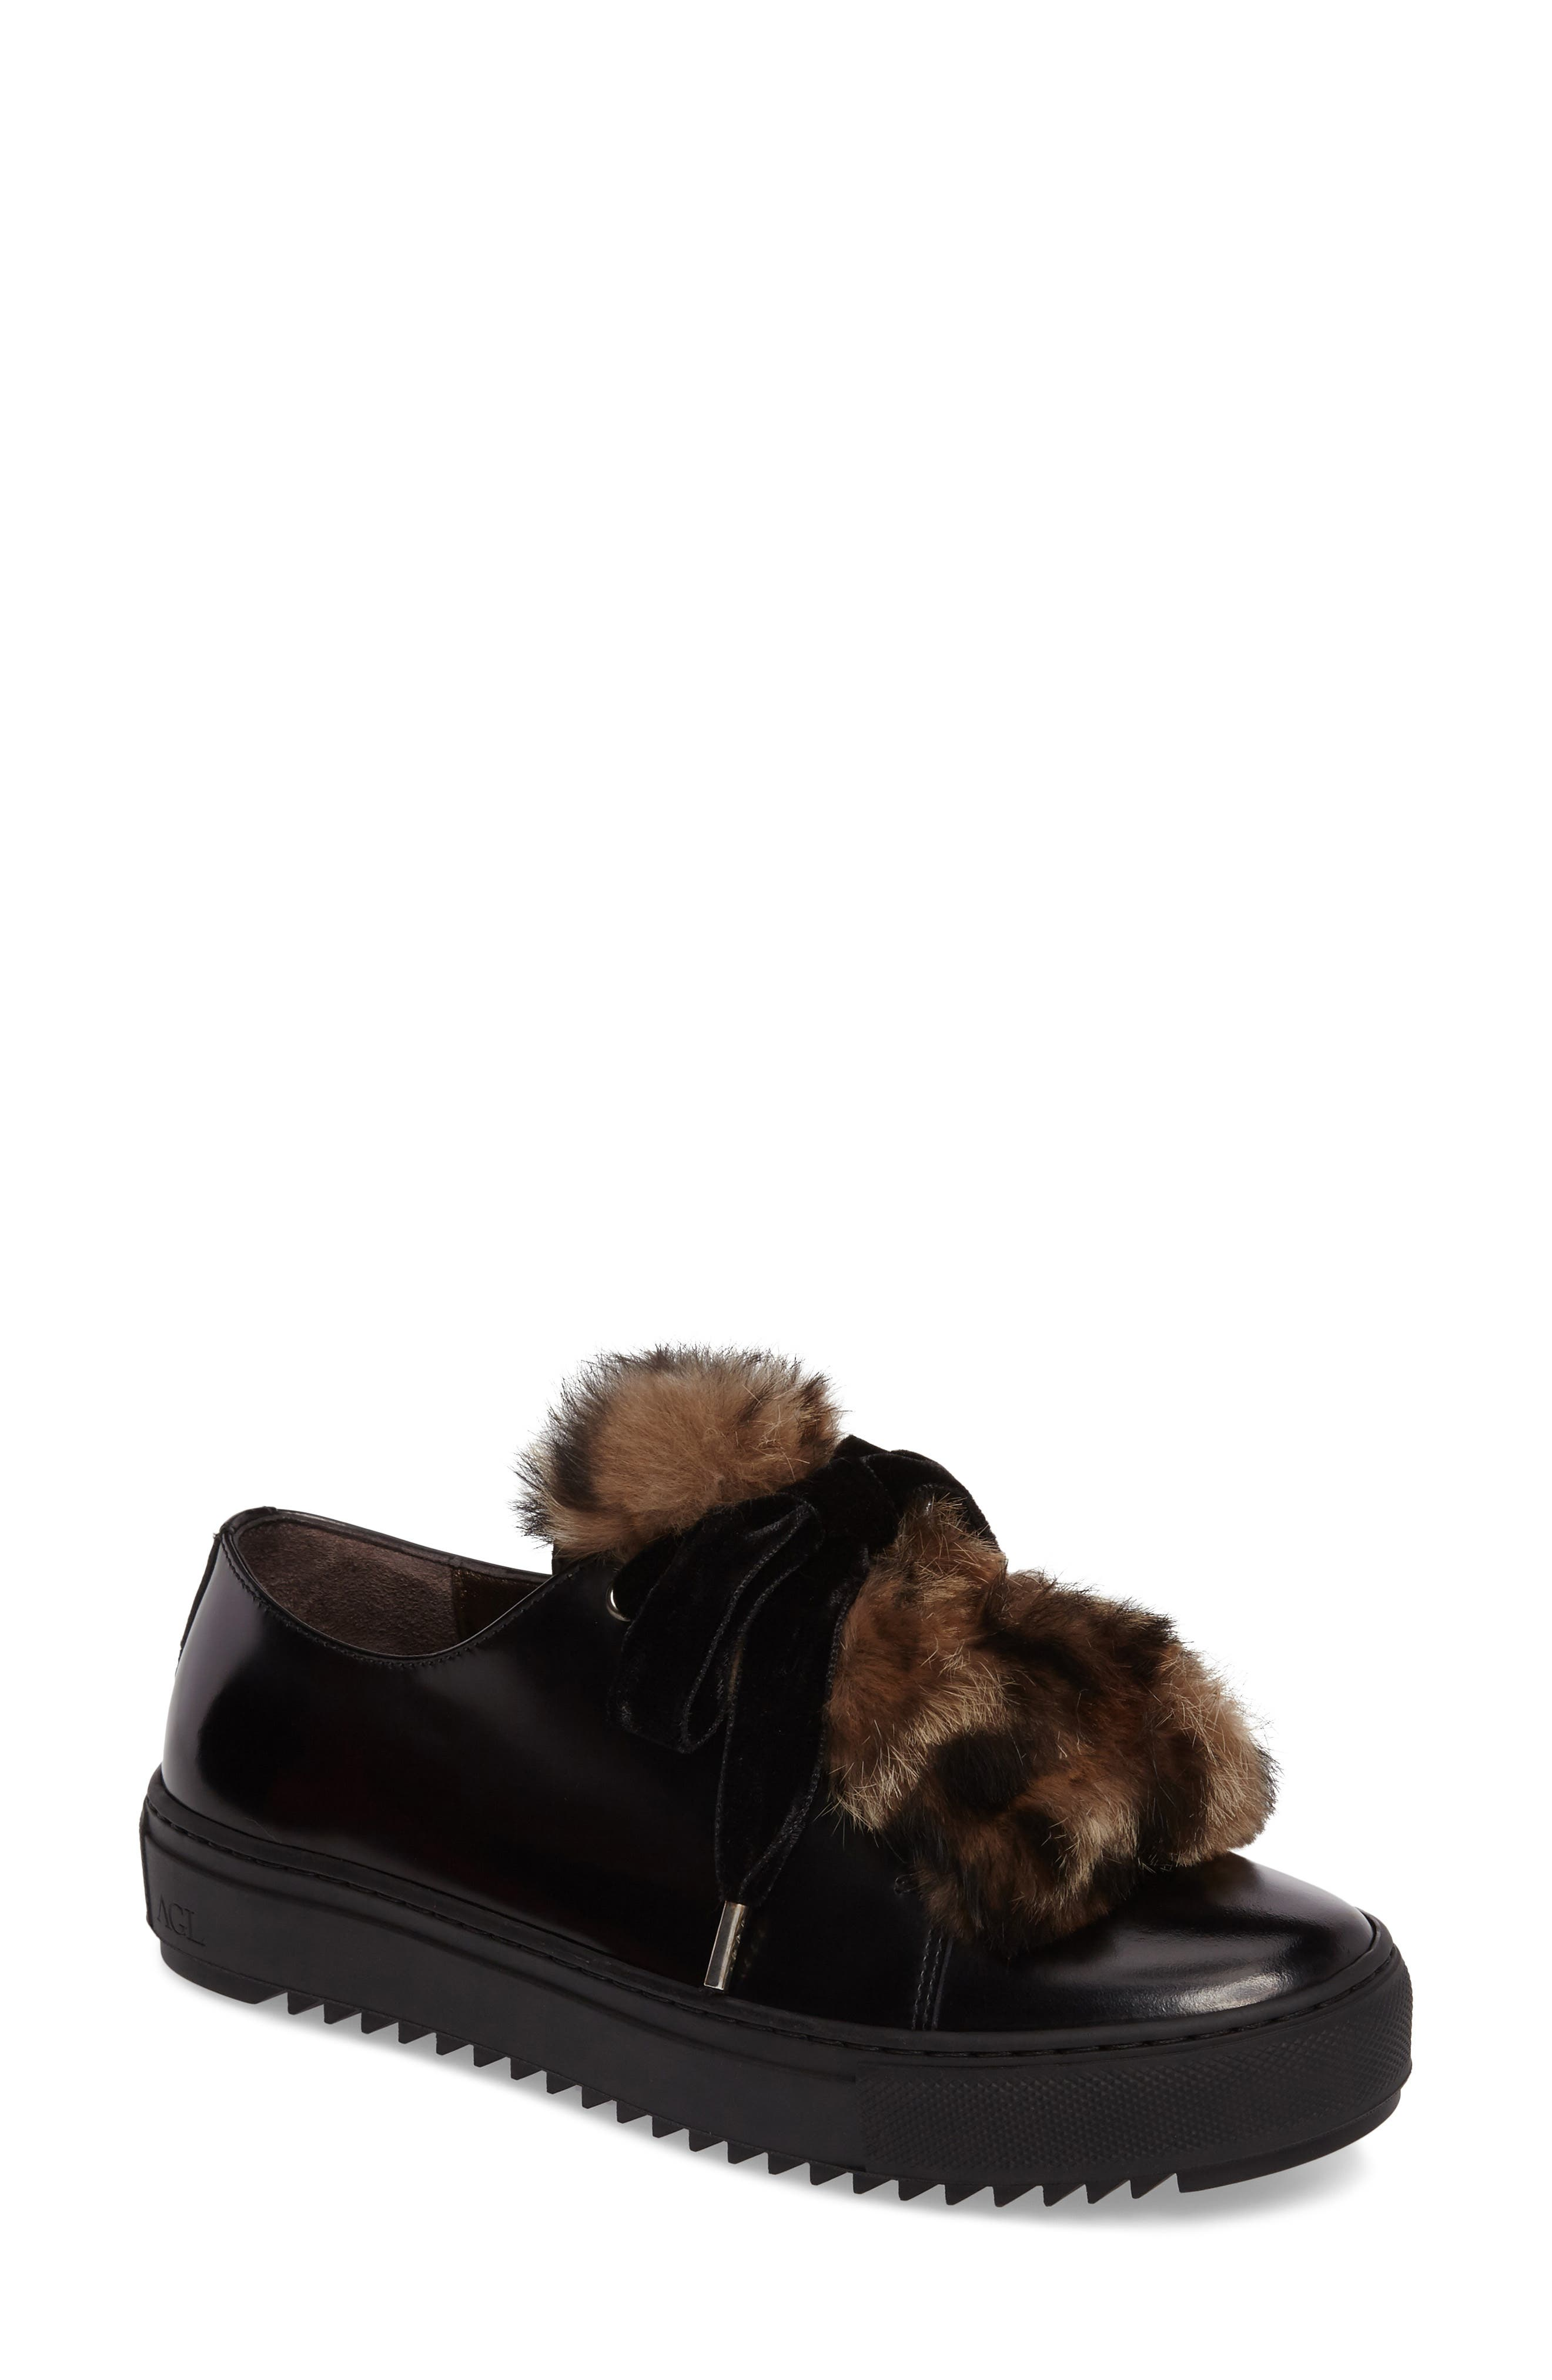 Main Image - AGL Fluff Genuine Rabbit Fur Sneaker (Women)